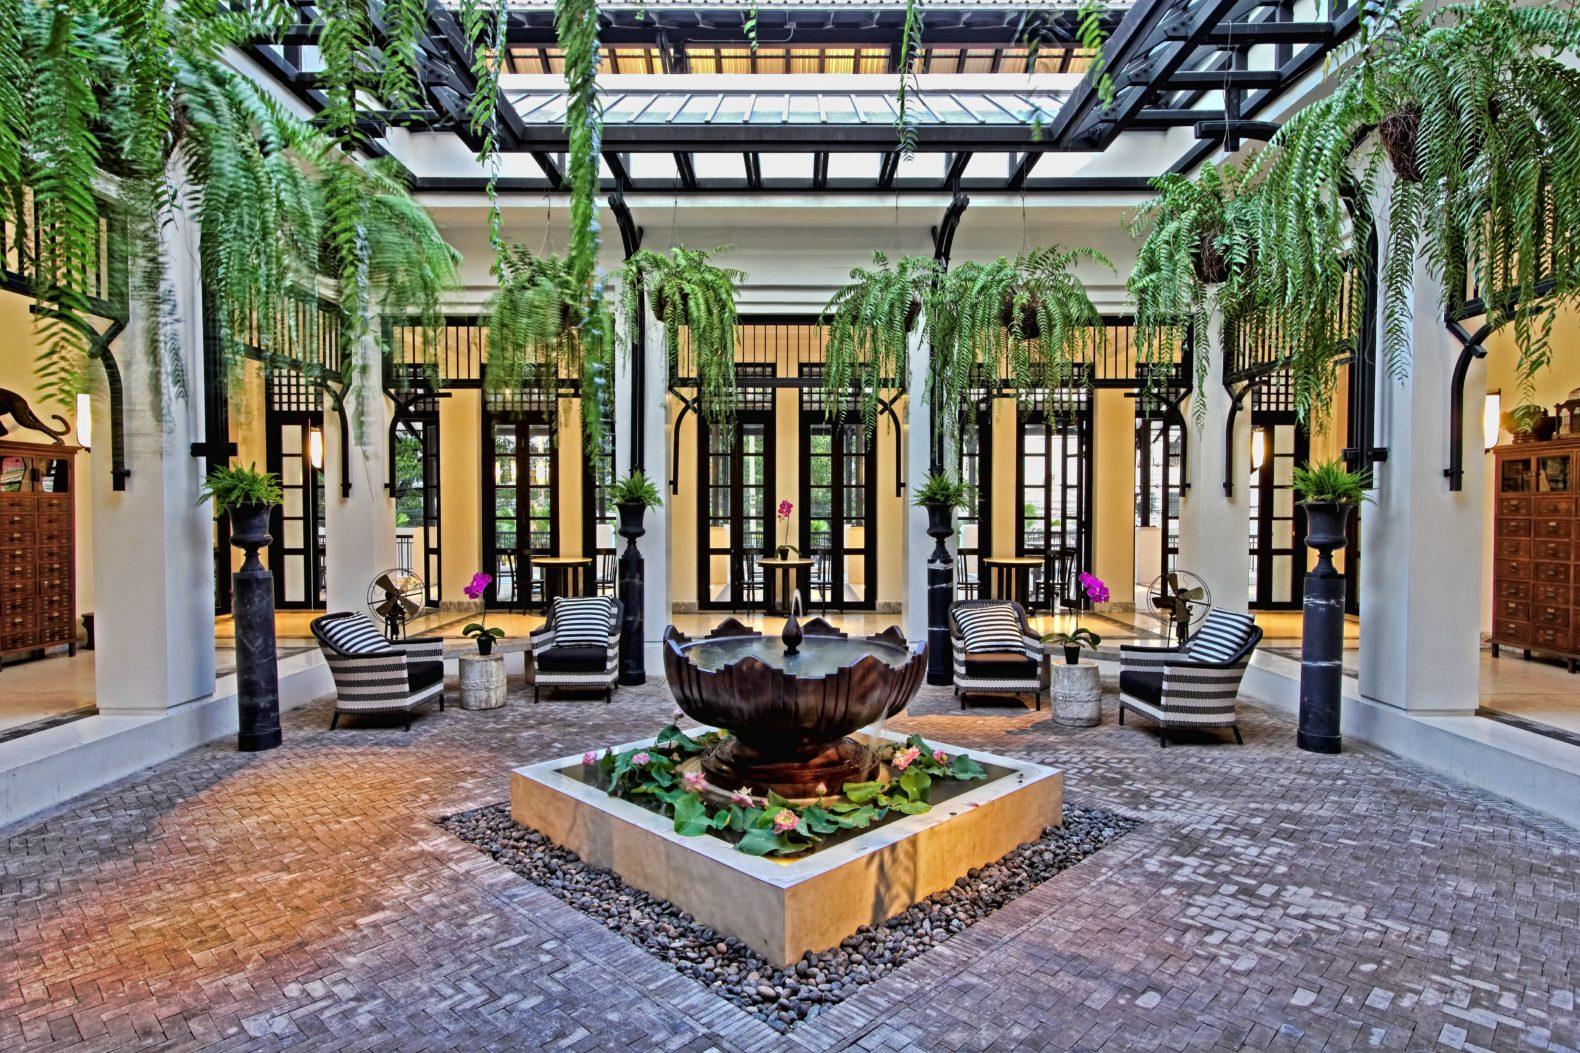 the-siam-lobby-dusk-the-siam-hotel-bangkok-thailand-asia